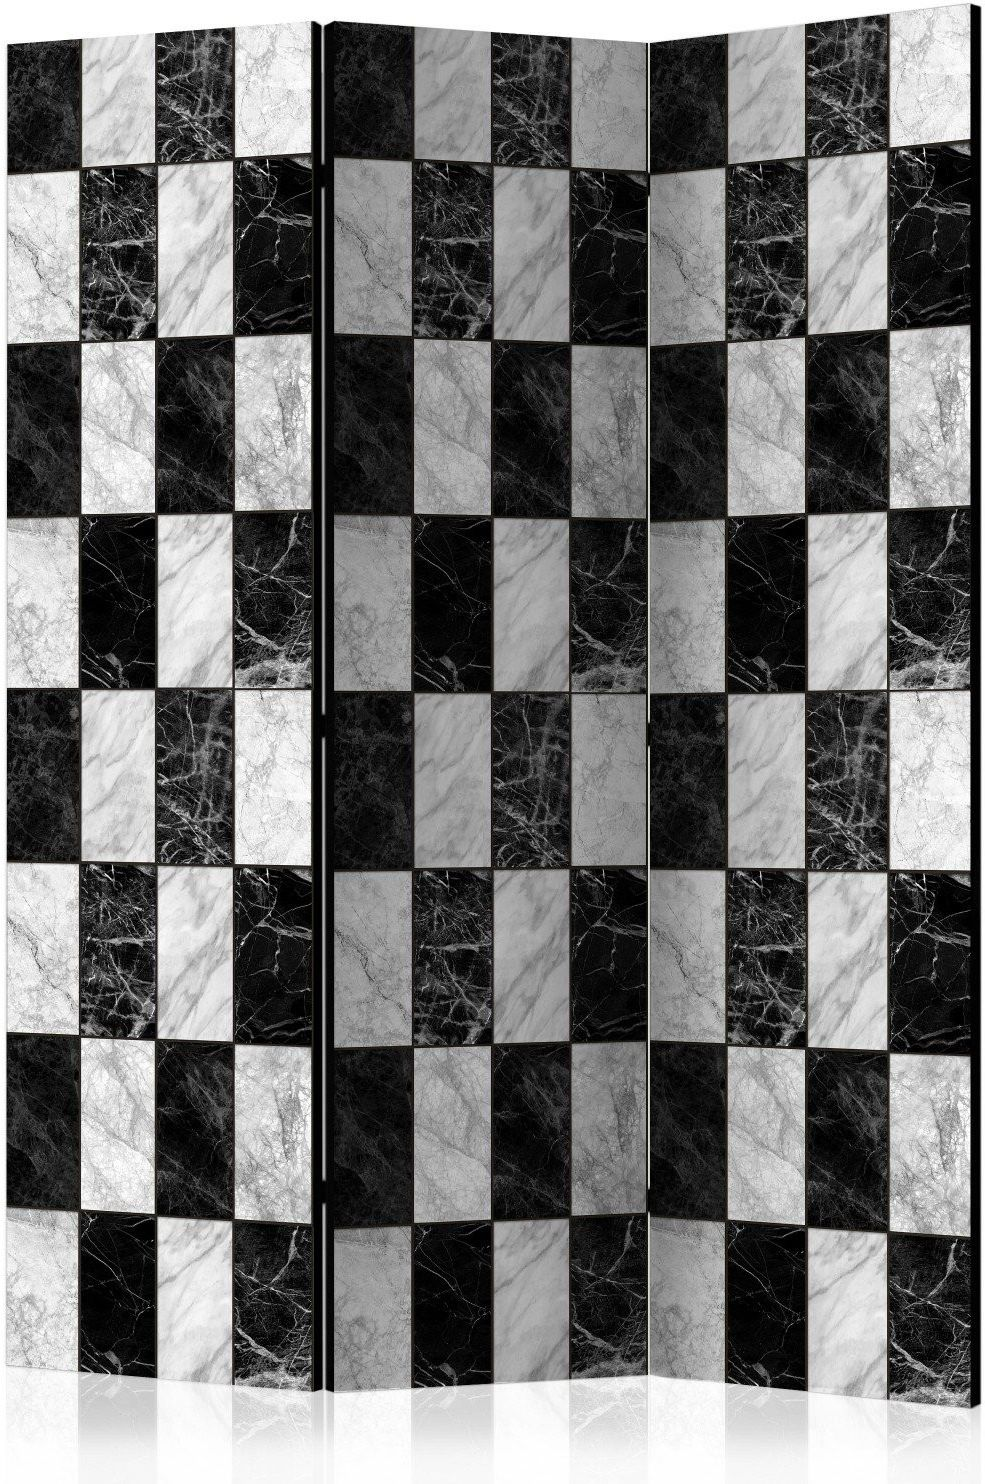 Parawan 3-częściowy - szachownica [room dividers]